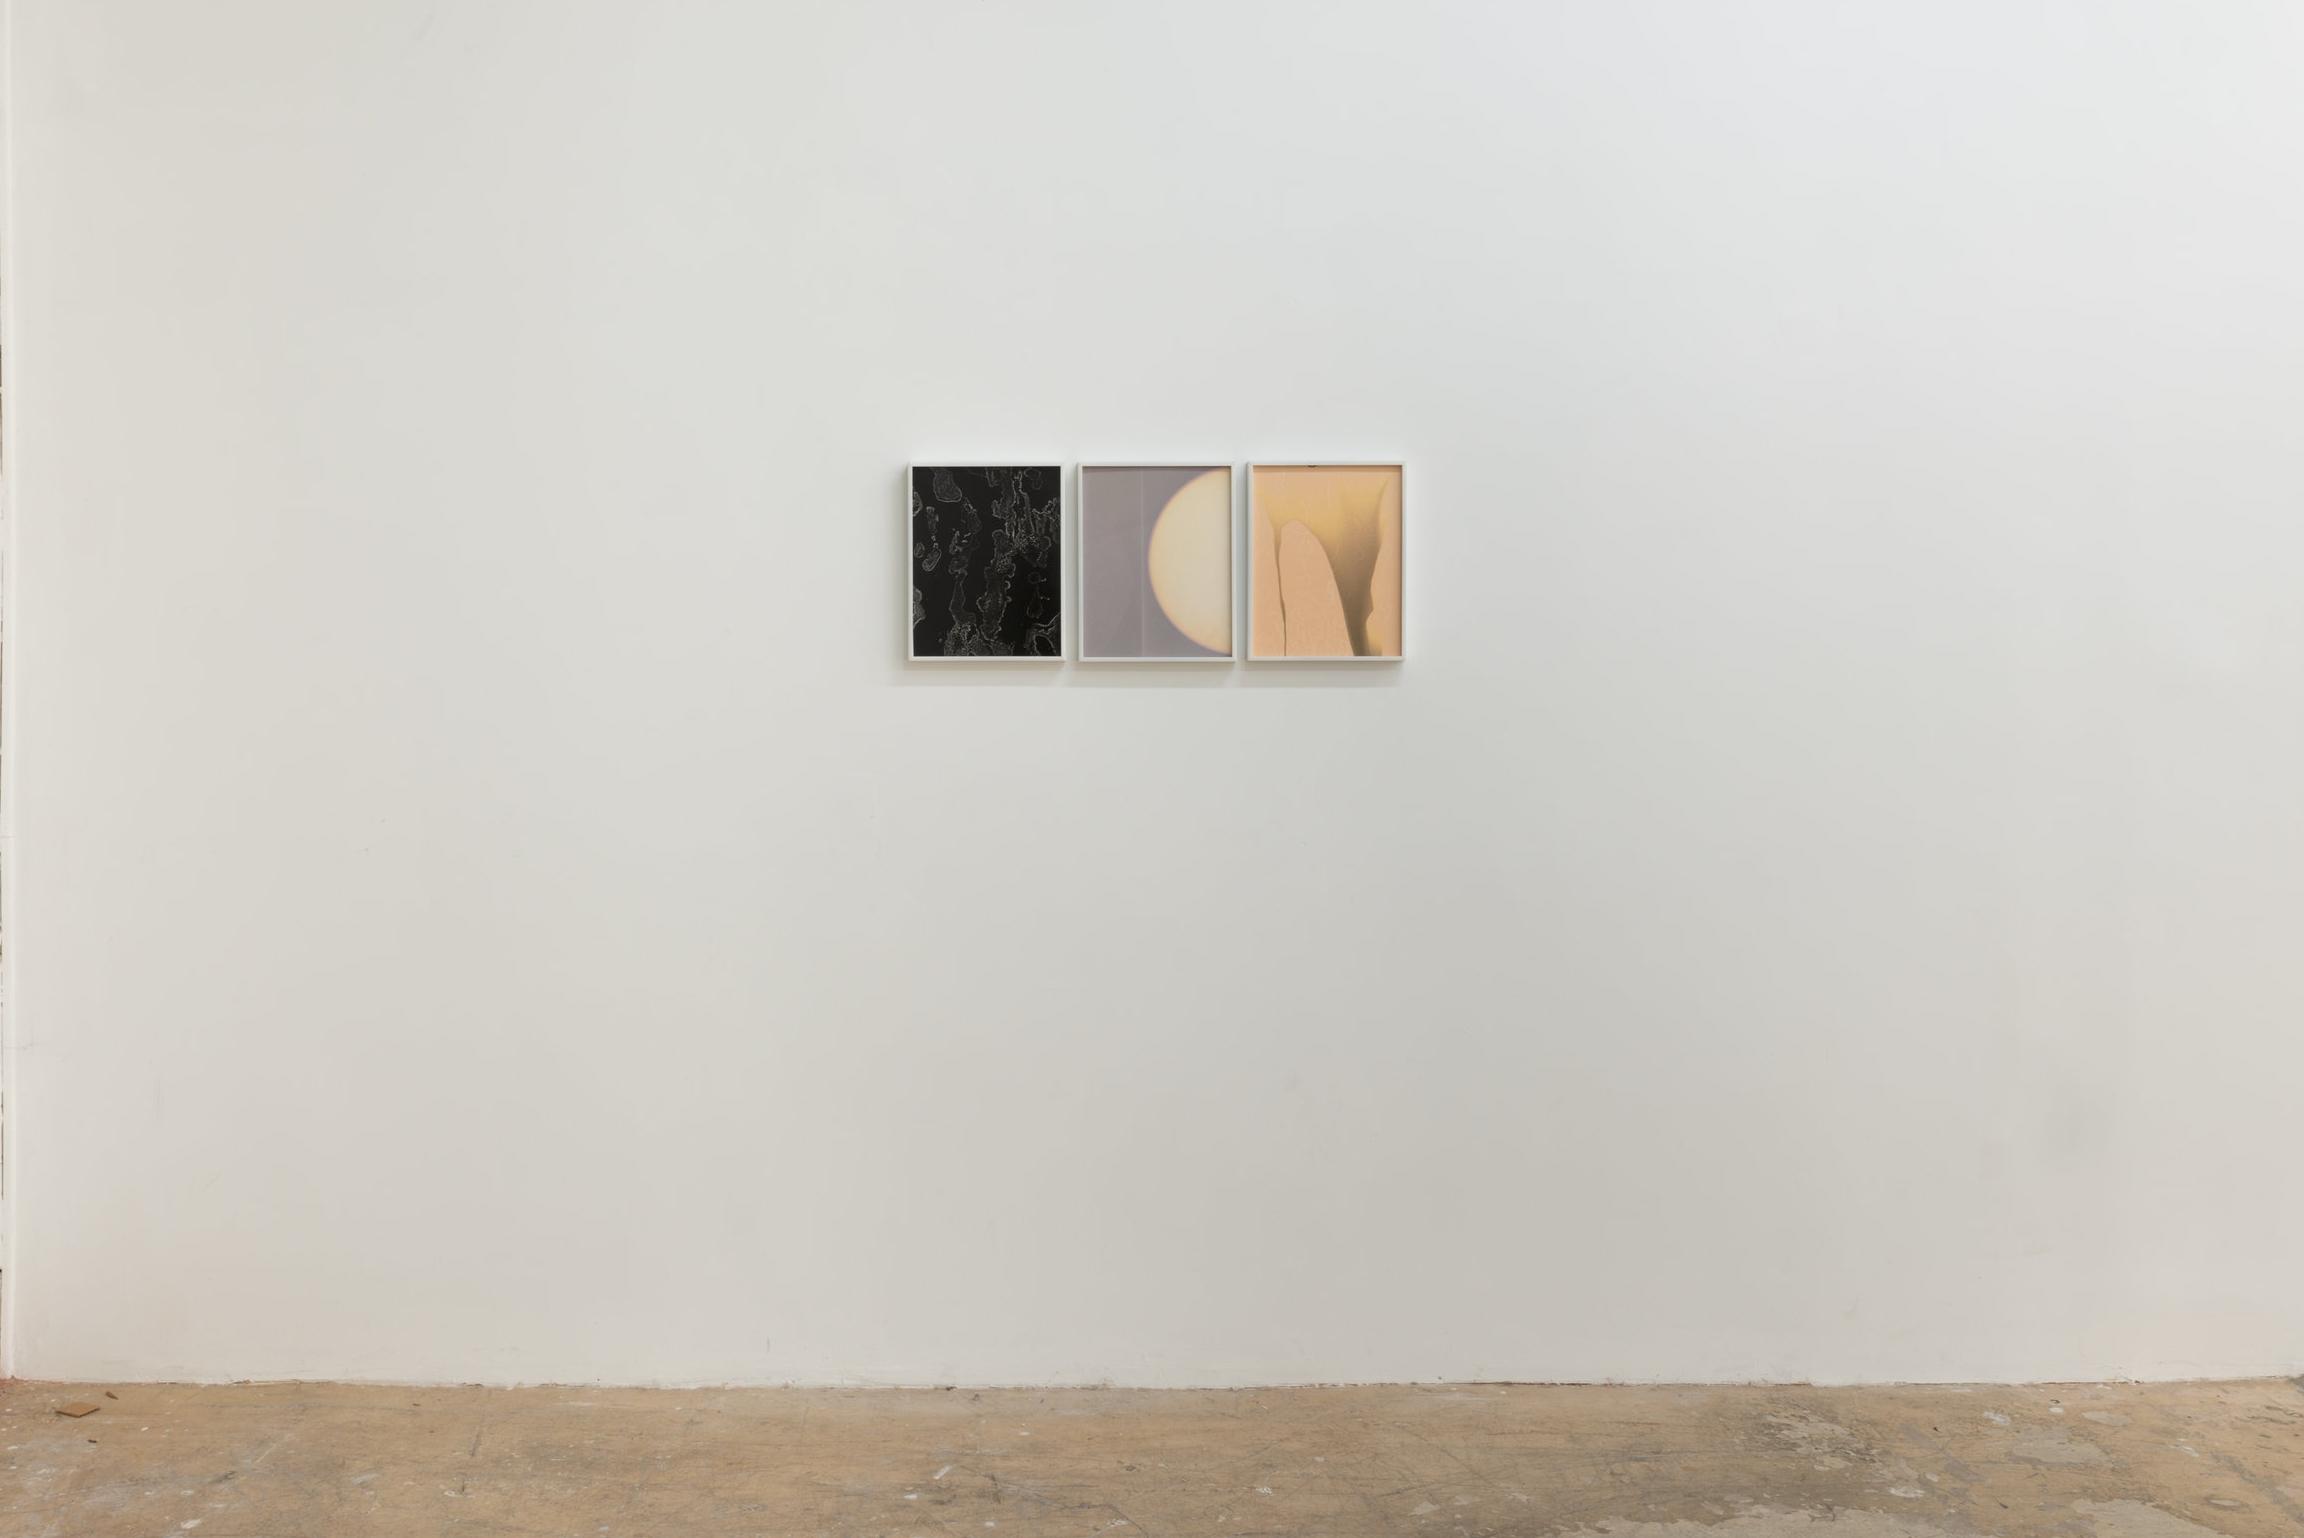 Left to Right:  Flow Genesis 11, Flow Genesis 12, and Flow Genesis 10, 2018.  Unique Silver Gelatin Photogram.